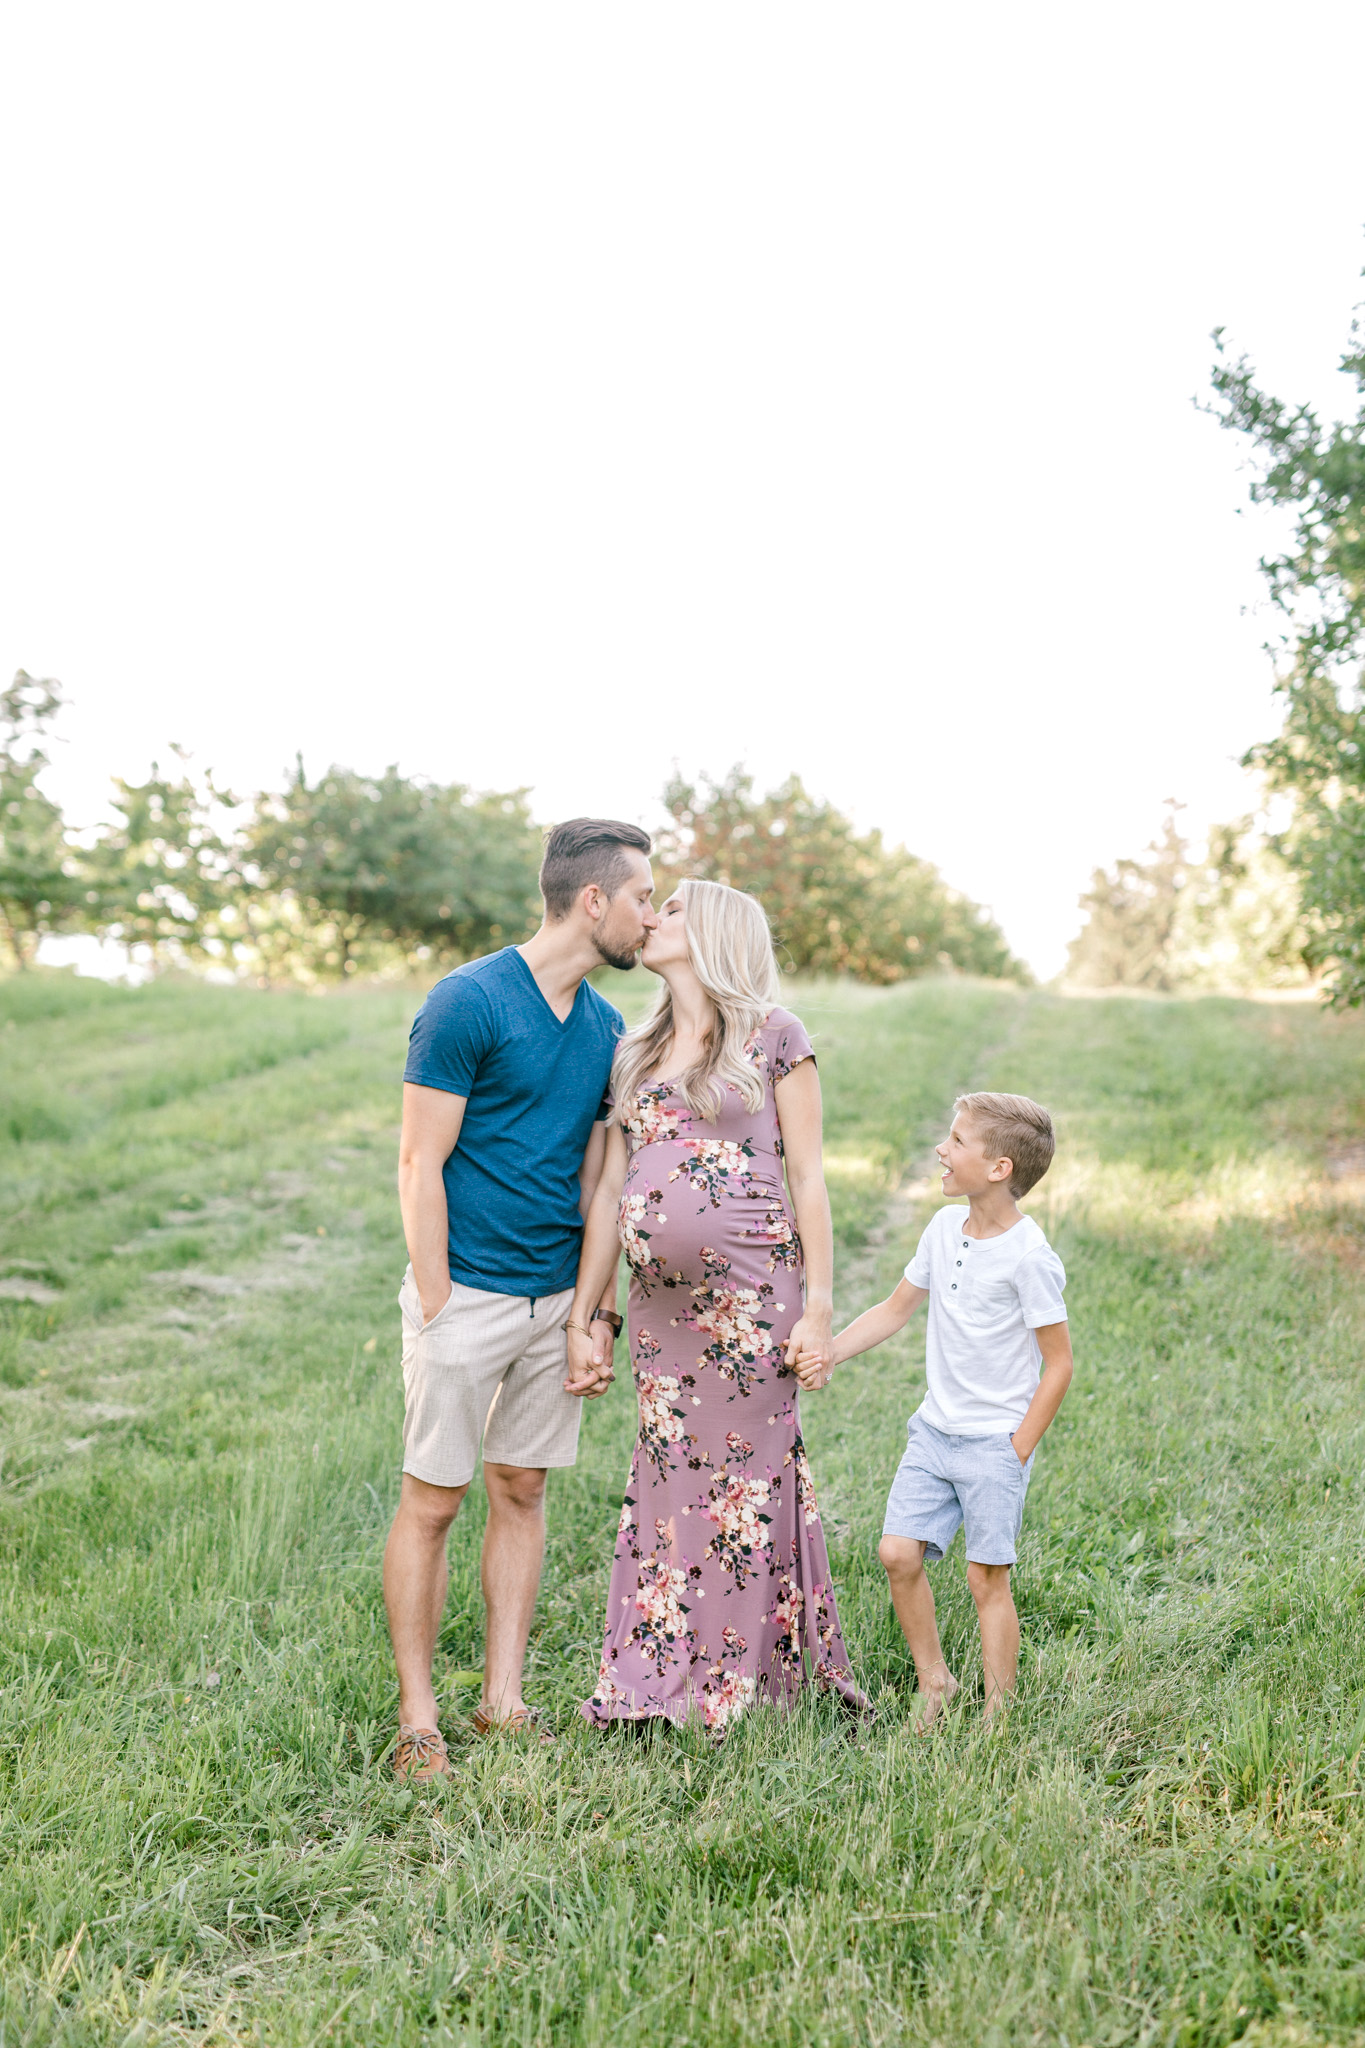 Beautiful Summer Family Maternity Session | Laurenda Marie Photography | Grand Rapids Michigan Maternity Photographer